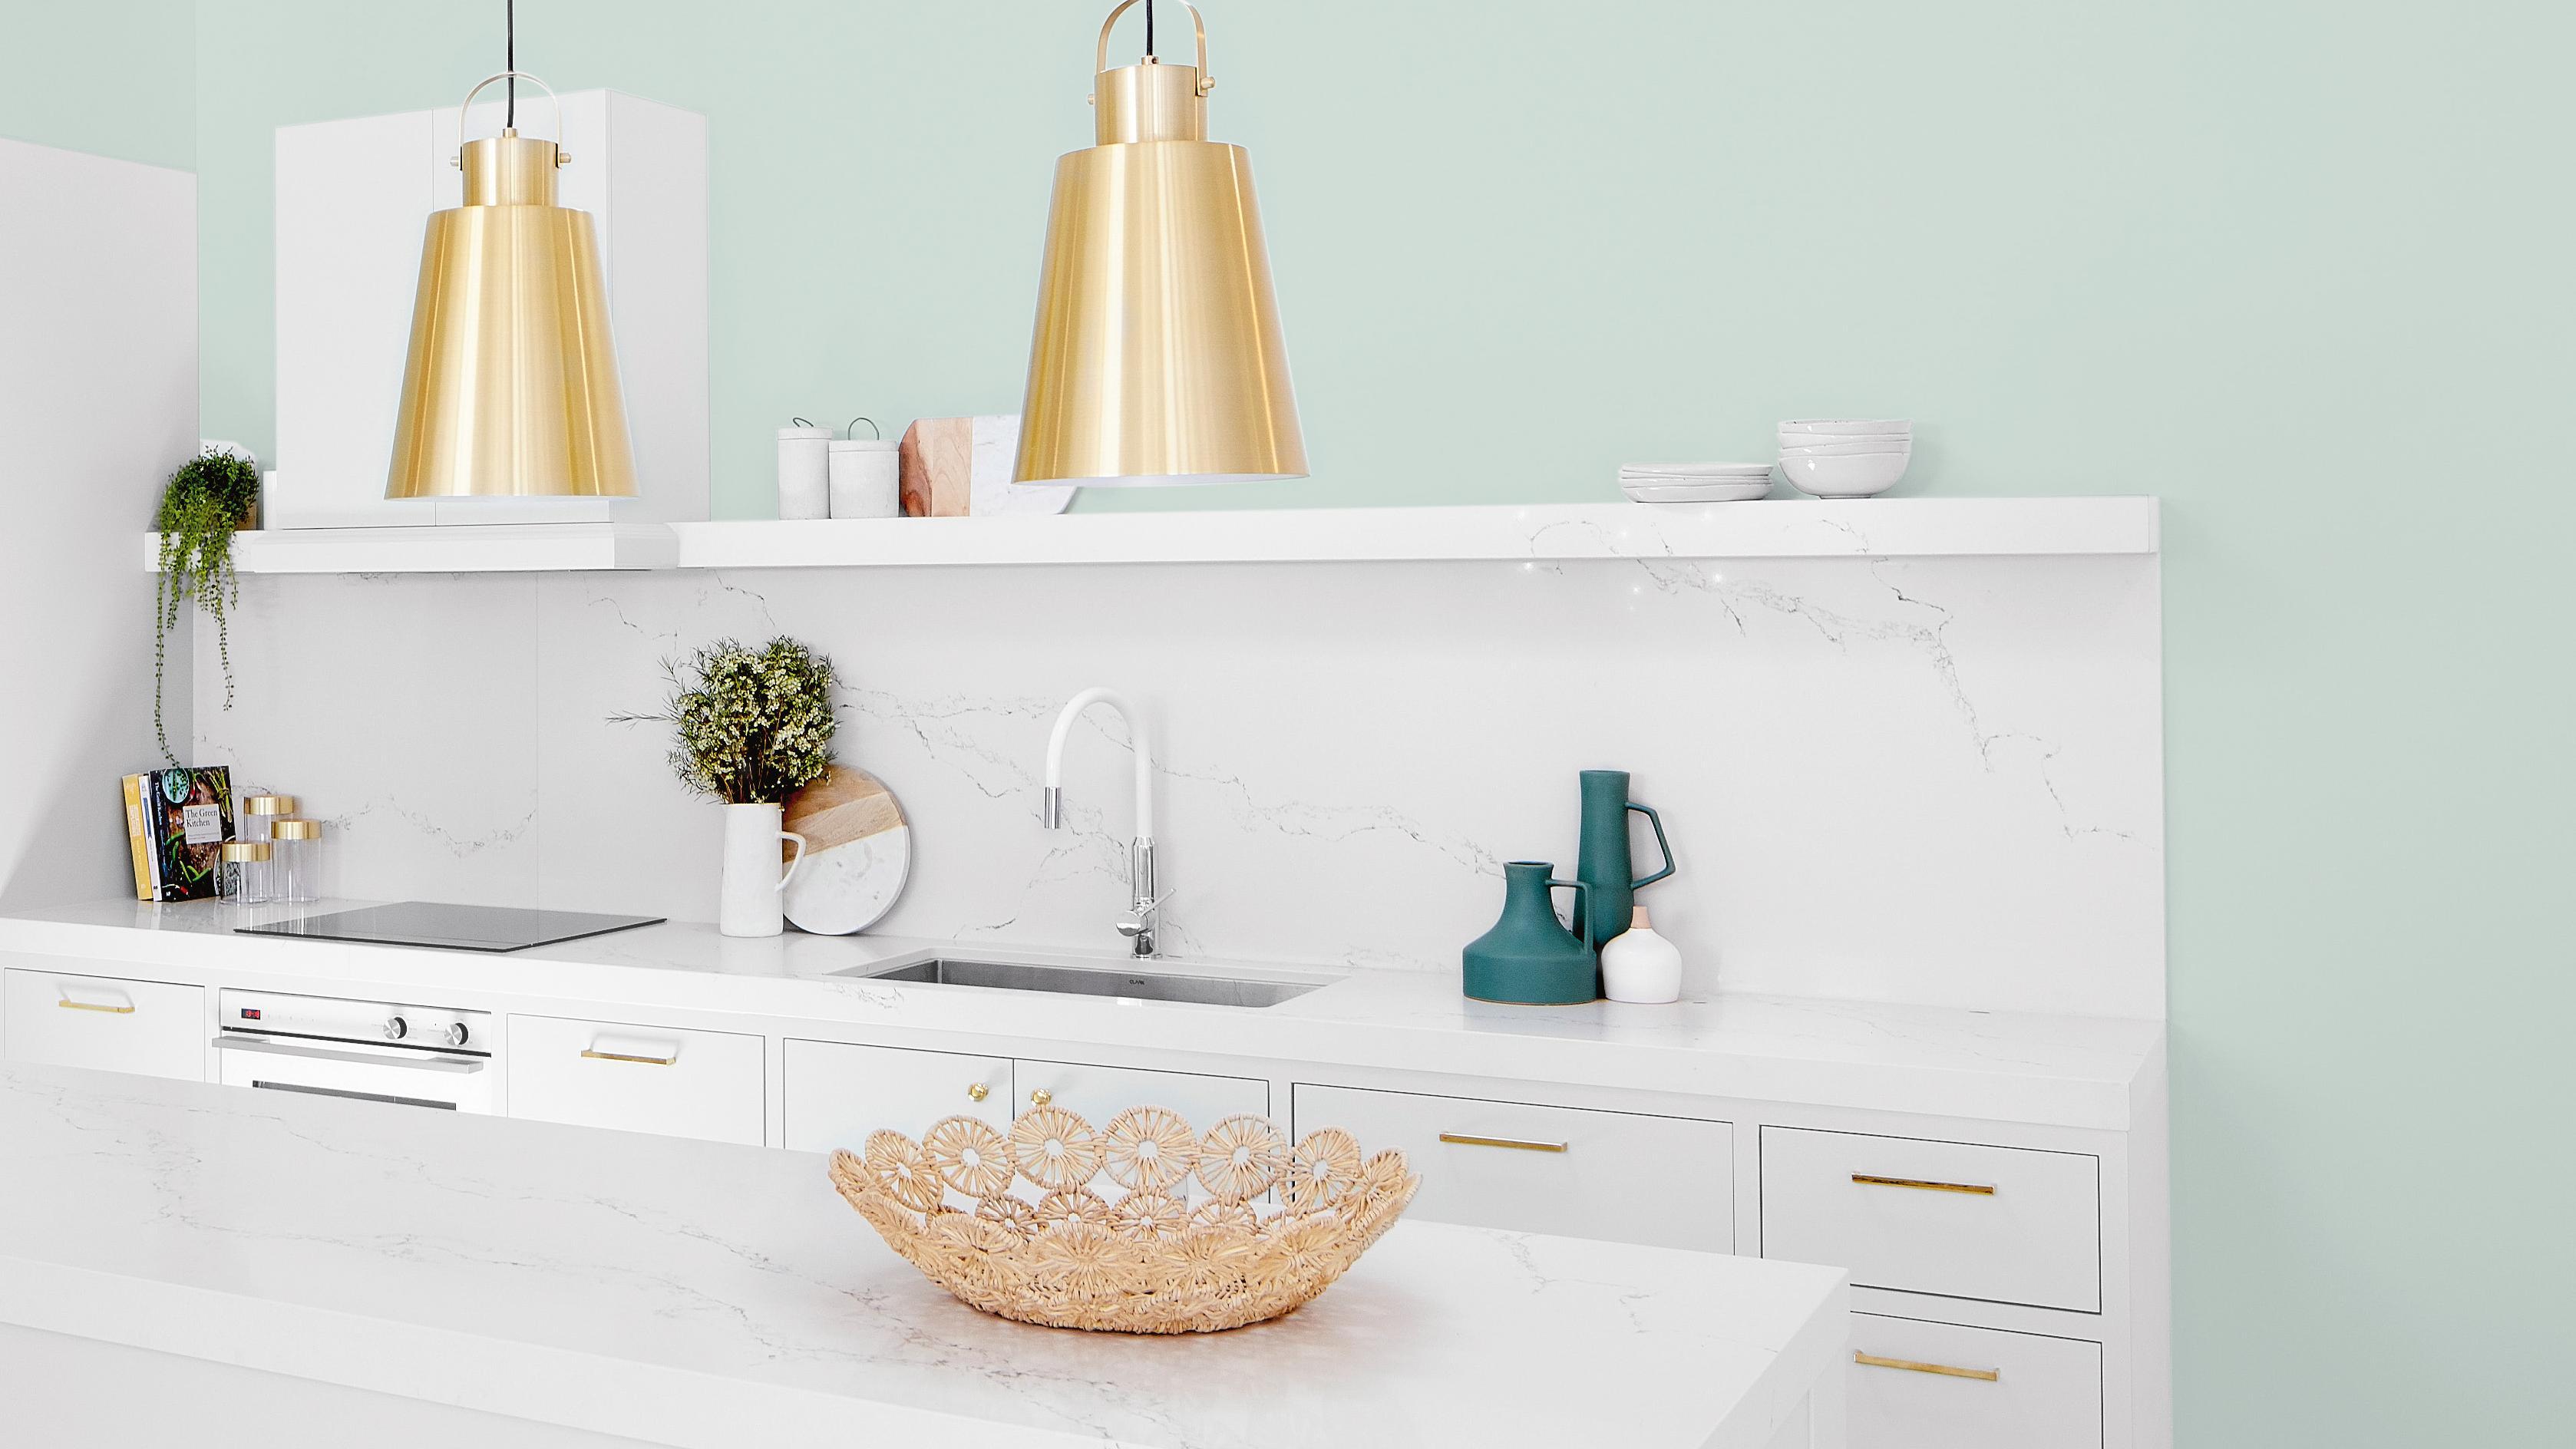 Marble kitchen - Aqua painted wall - Kitchen - Medium - Taubmans